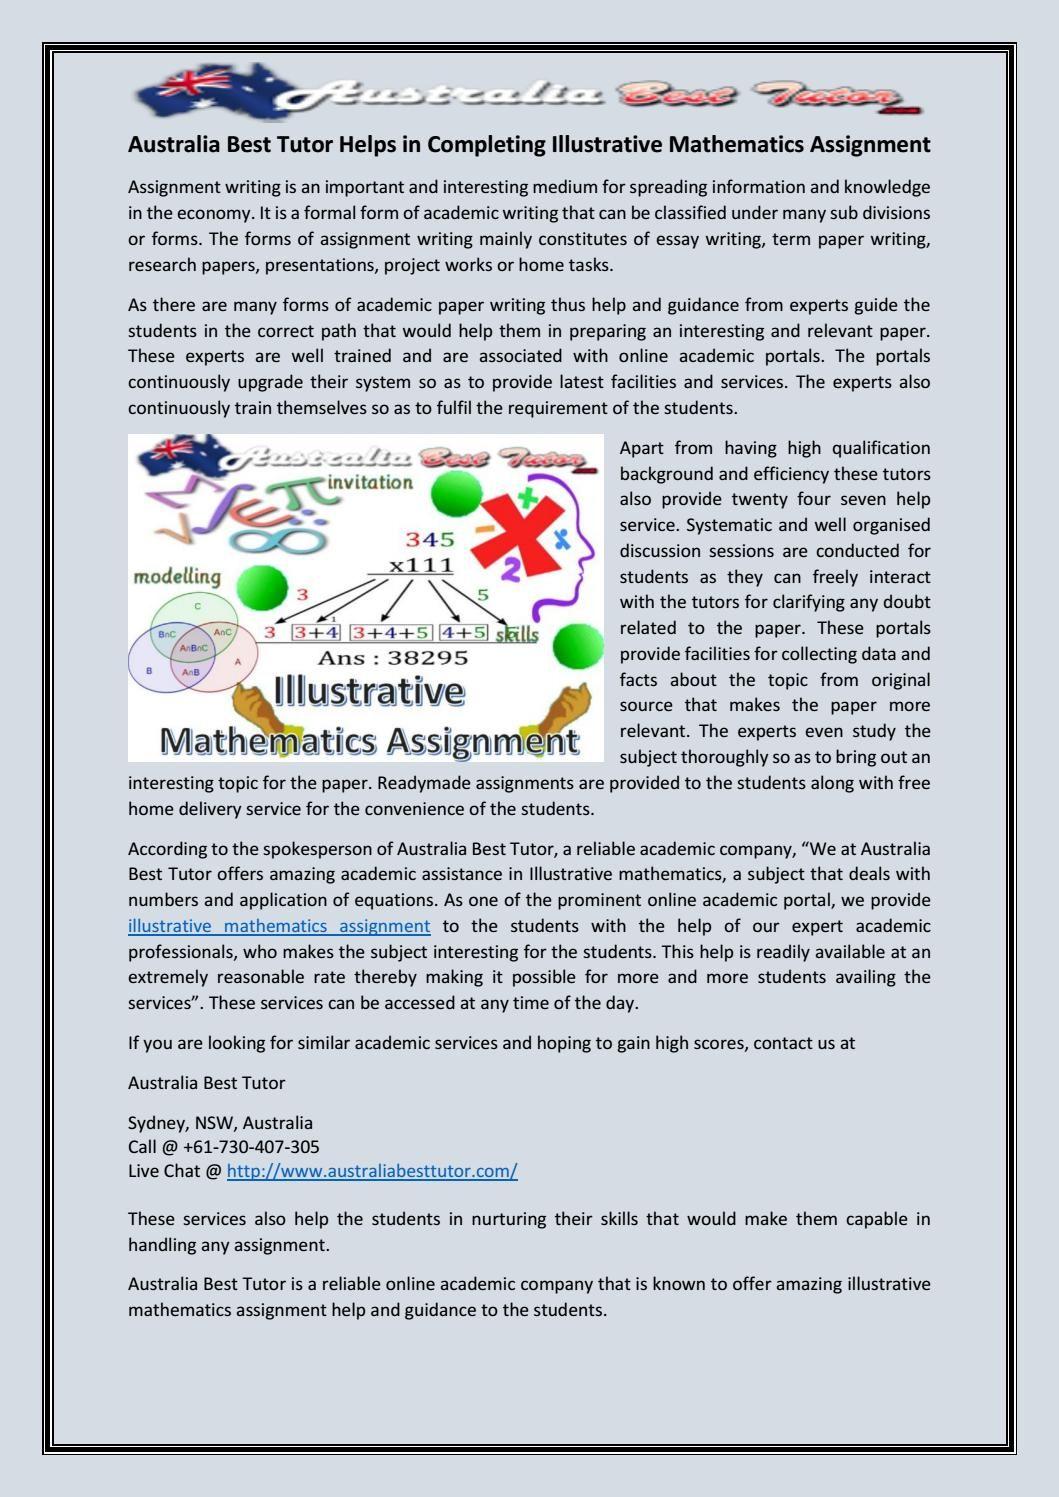 Australia best tutor helps in completing illustrative mathematics ...